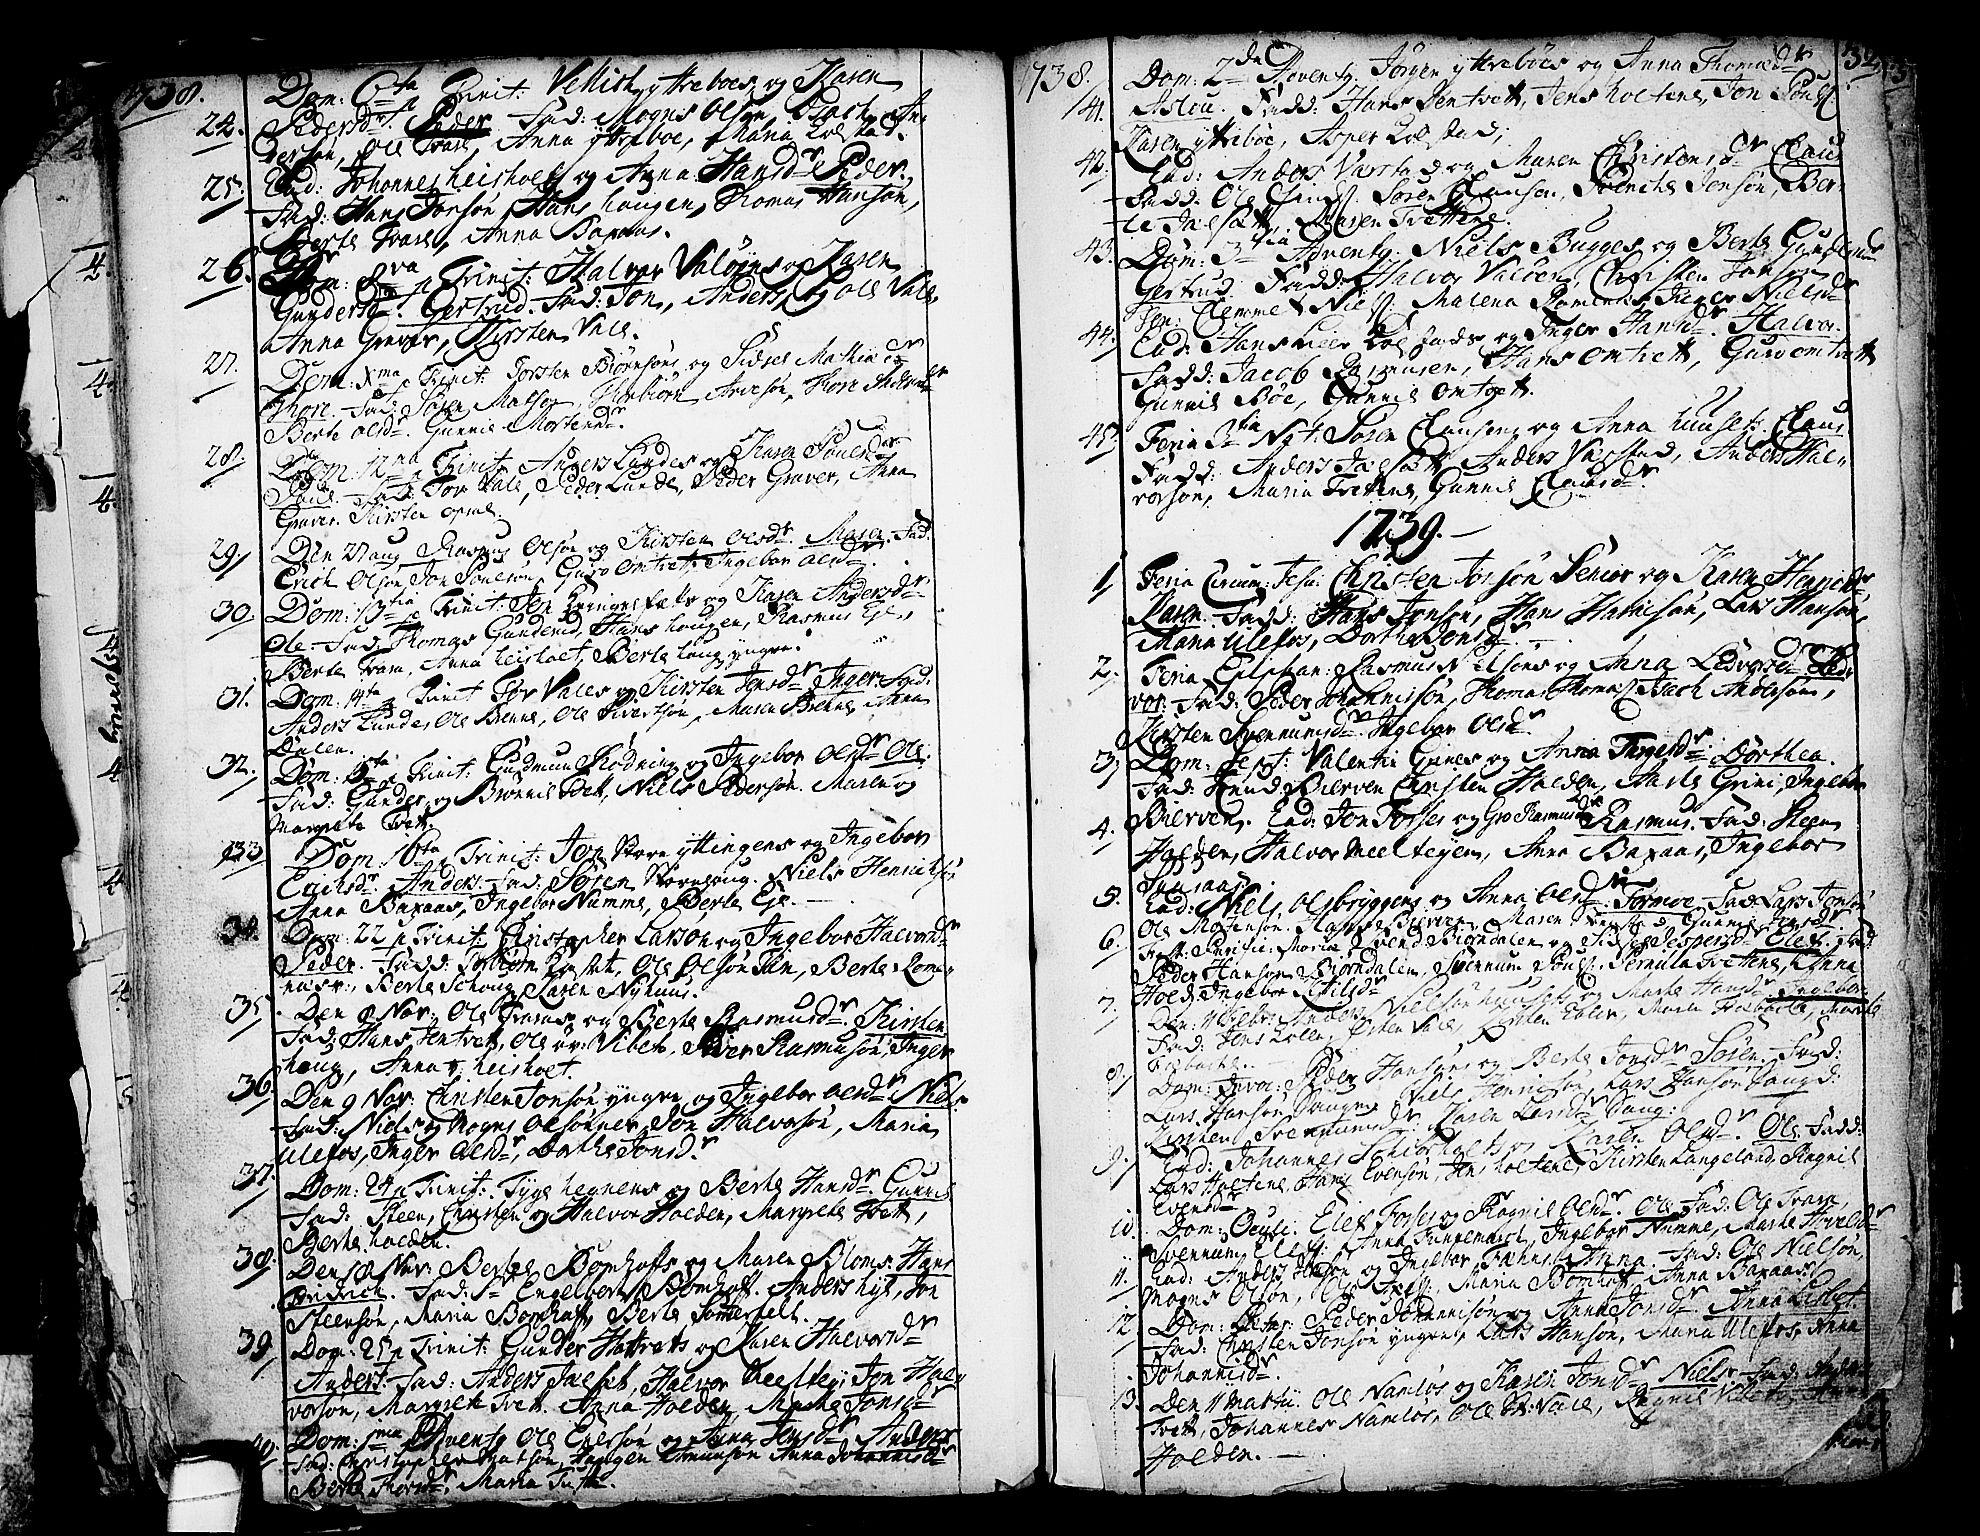 SAKO, Holla kirkebøker, F/Fa/L0001: Ministerialbok nr. 1, 1717-1779, s. 32